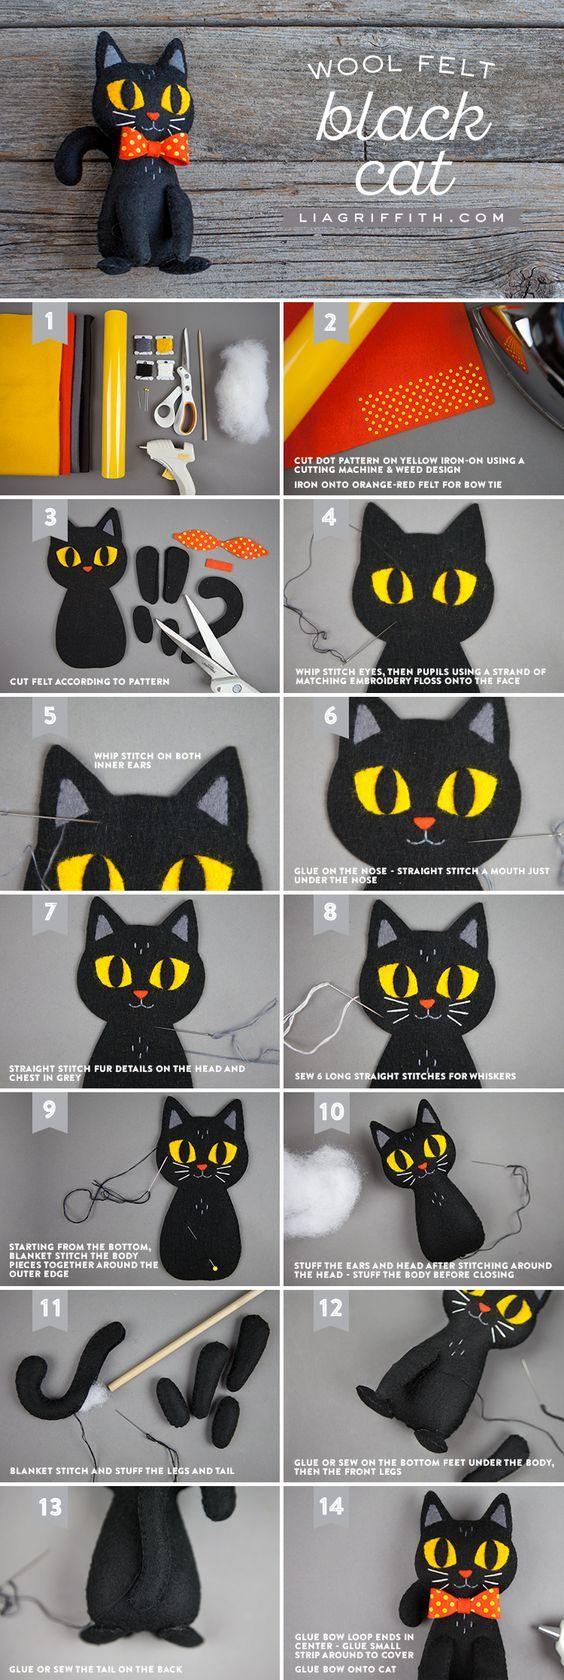 DIY Black Cat Stuffie - Lia Griffith - www.liagriffith.com #diyhalloween #stuffedanimal #felt #feltcute #feltcraft #feltcrafting #feltcrafts #diykids #diytoys #madewithlia